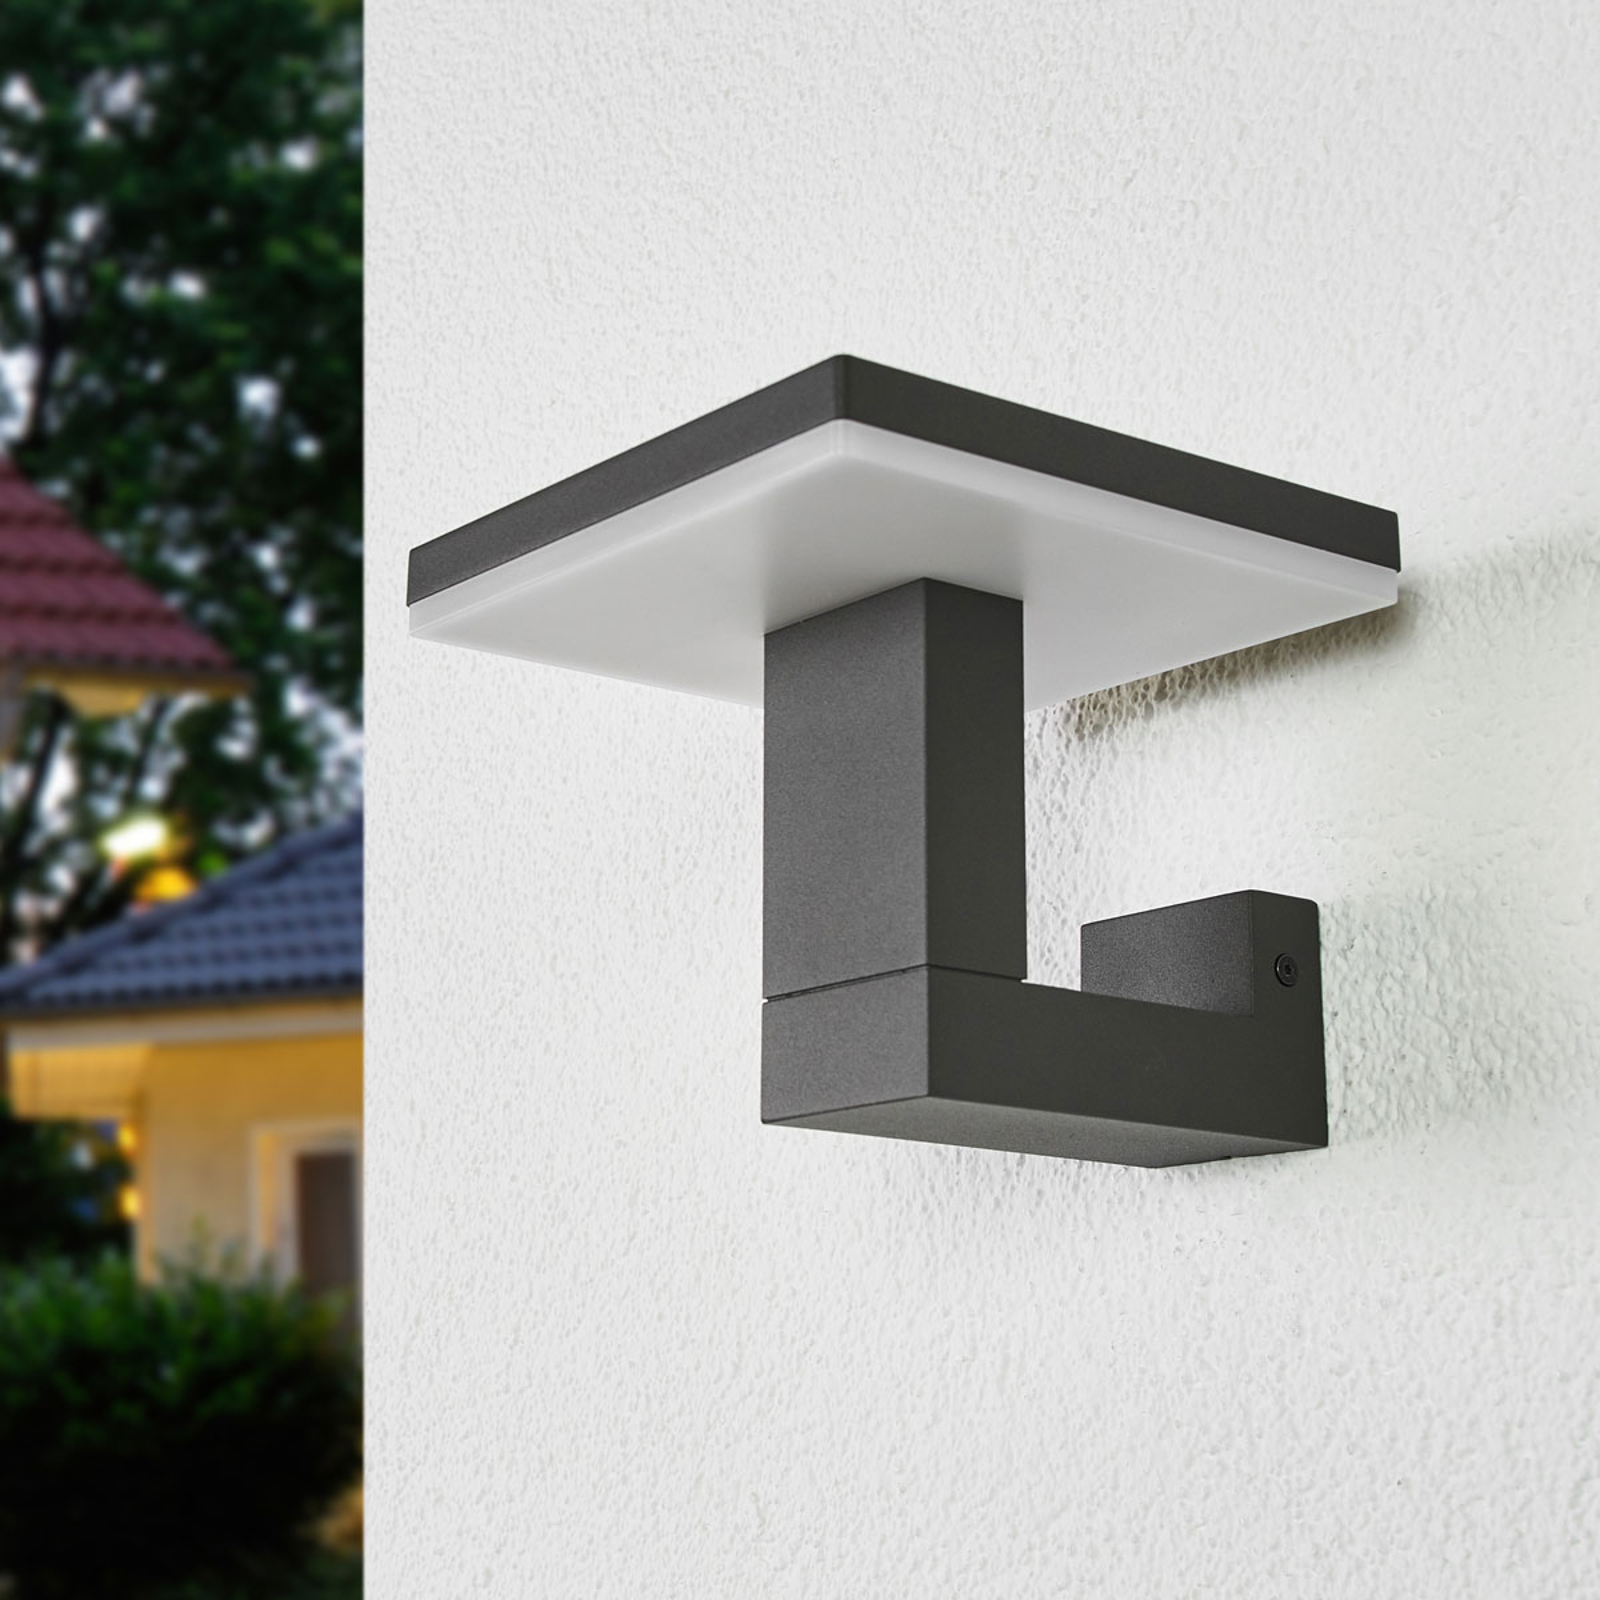 LED-ulkoseinälamppu Olesia, kulmikas